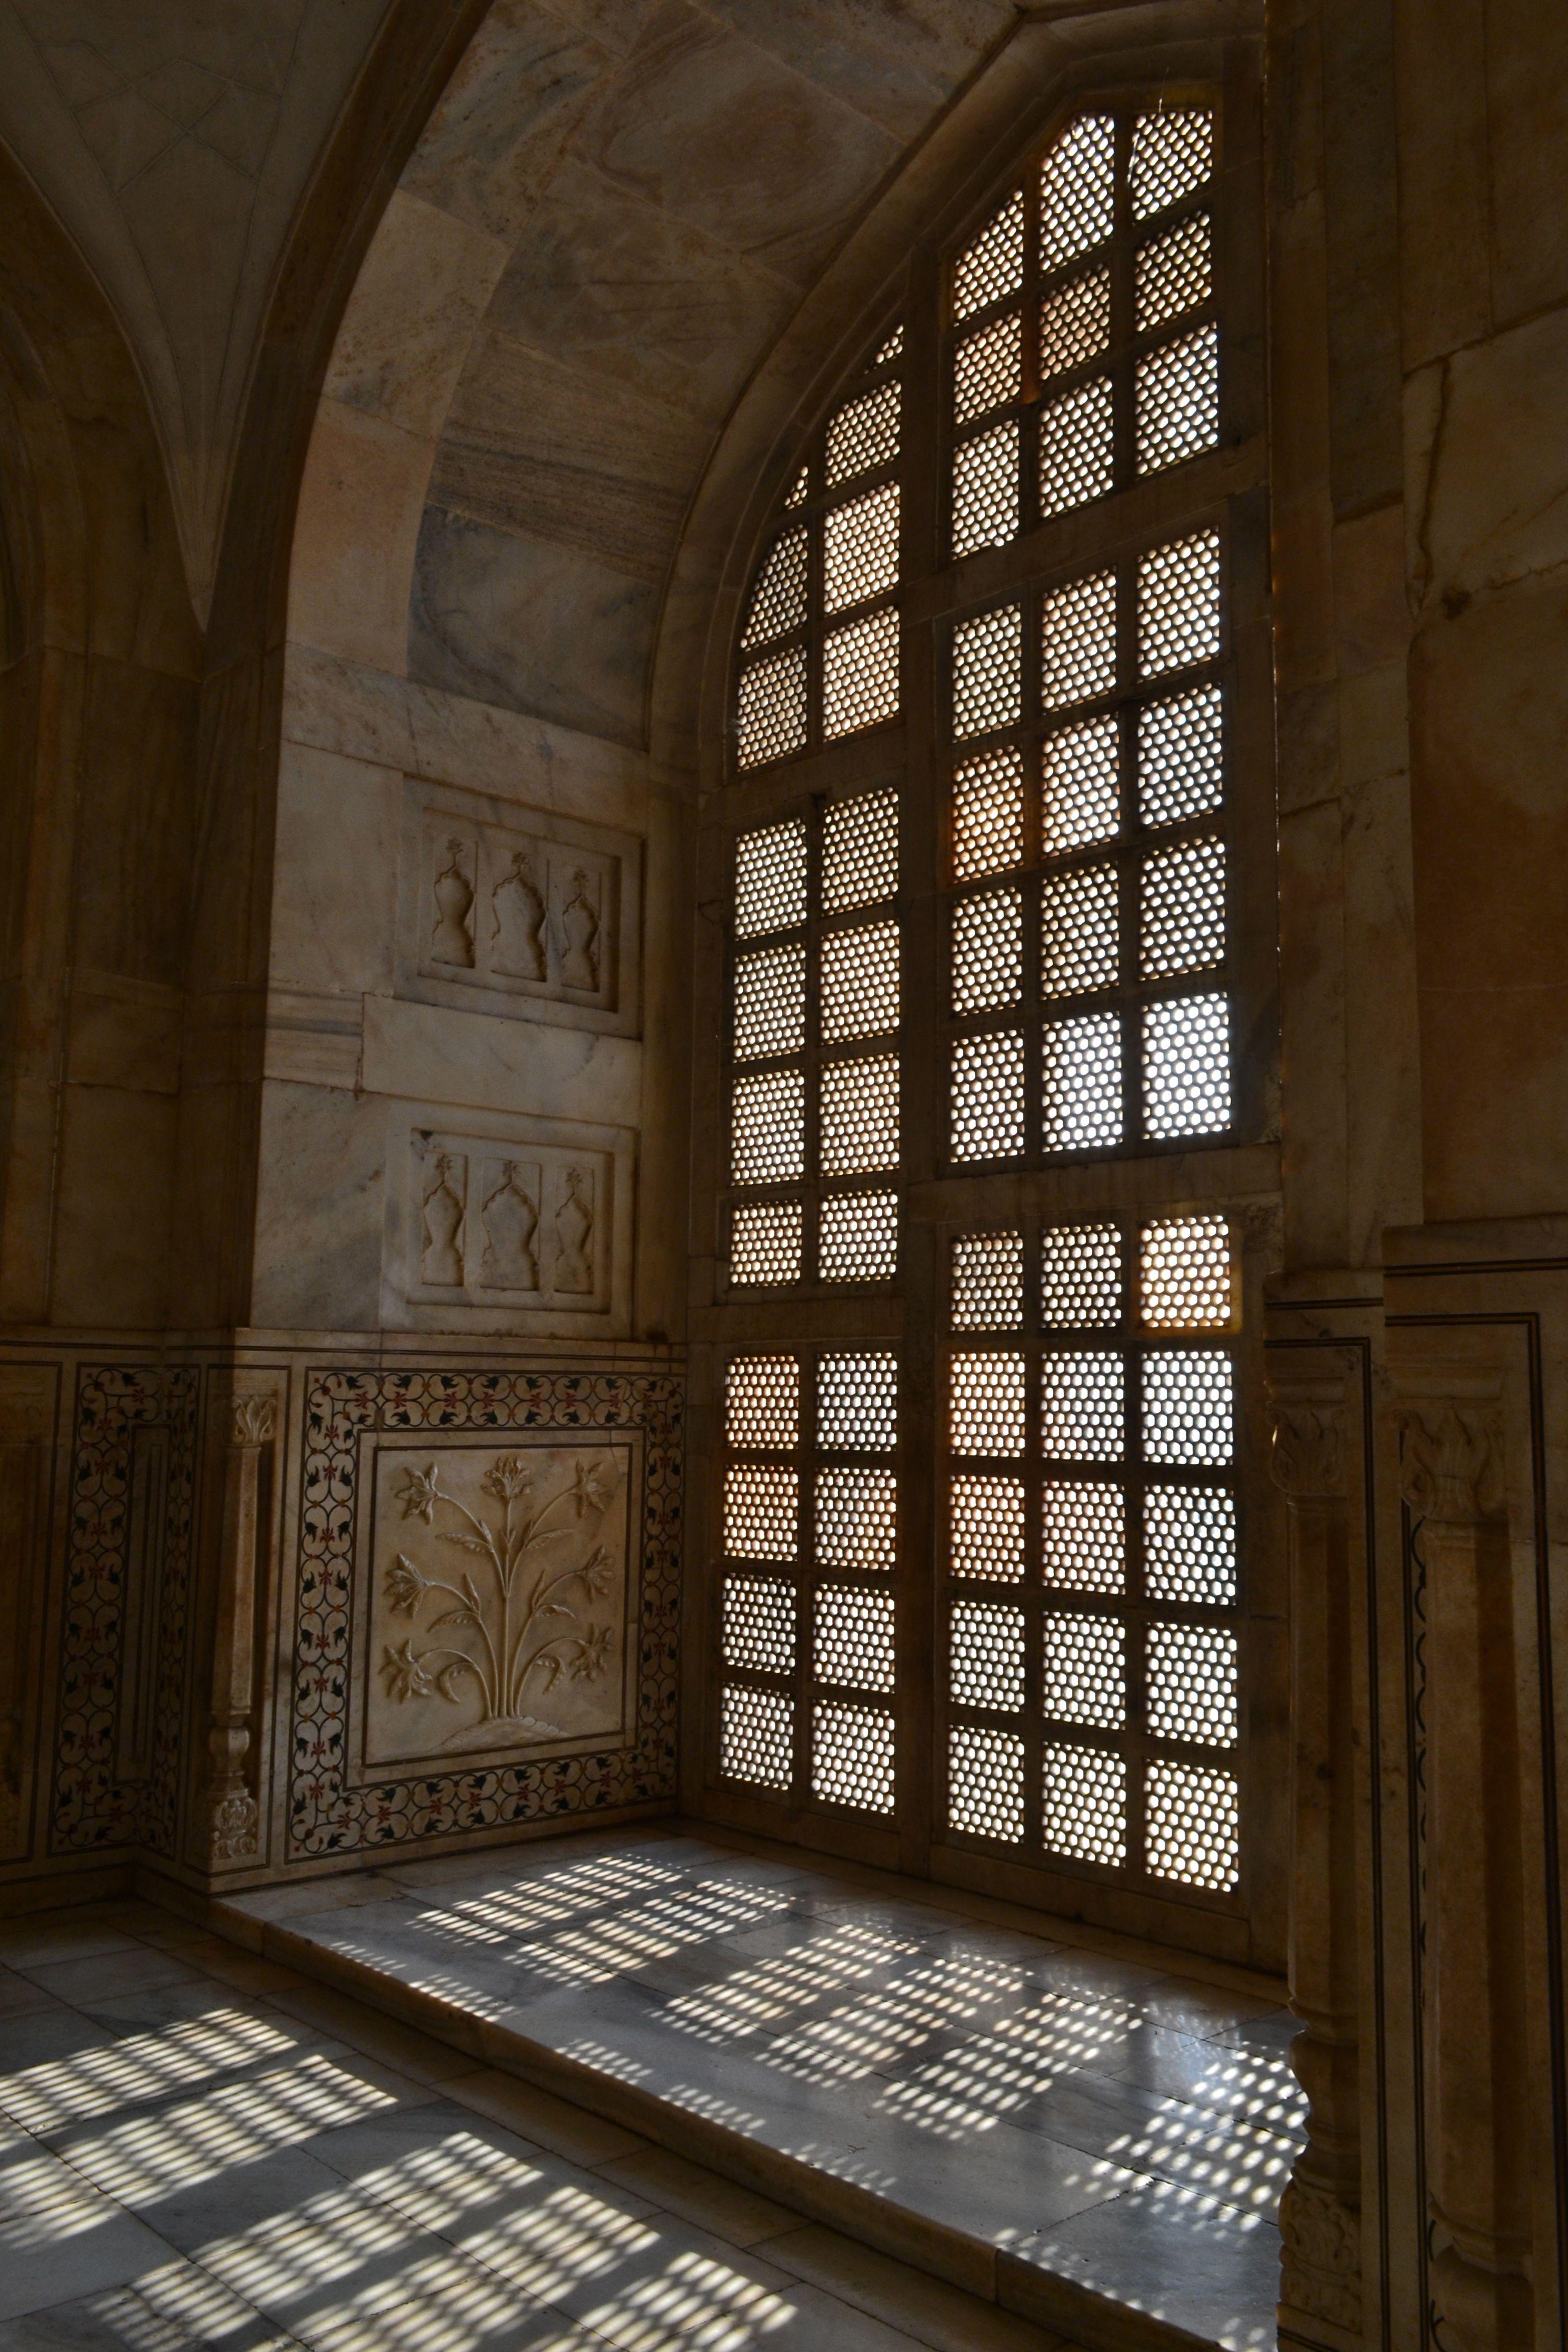 Intricate jail work at the Taj Mahal, India